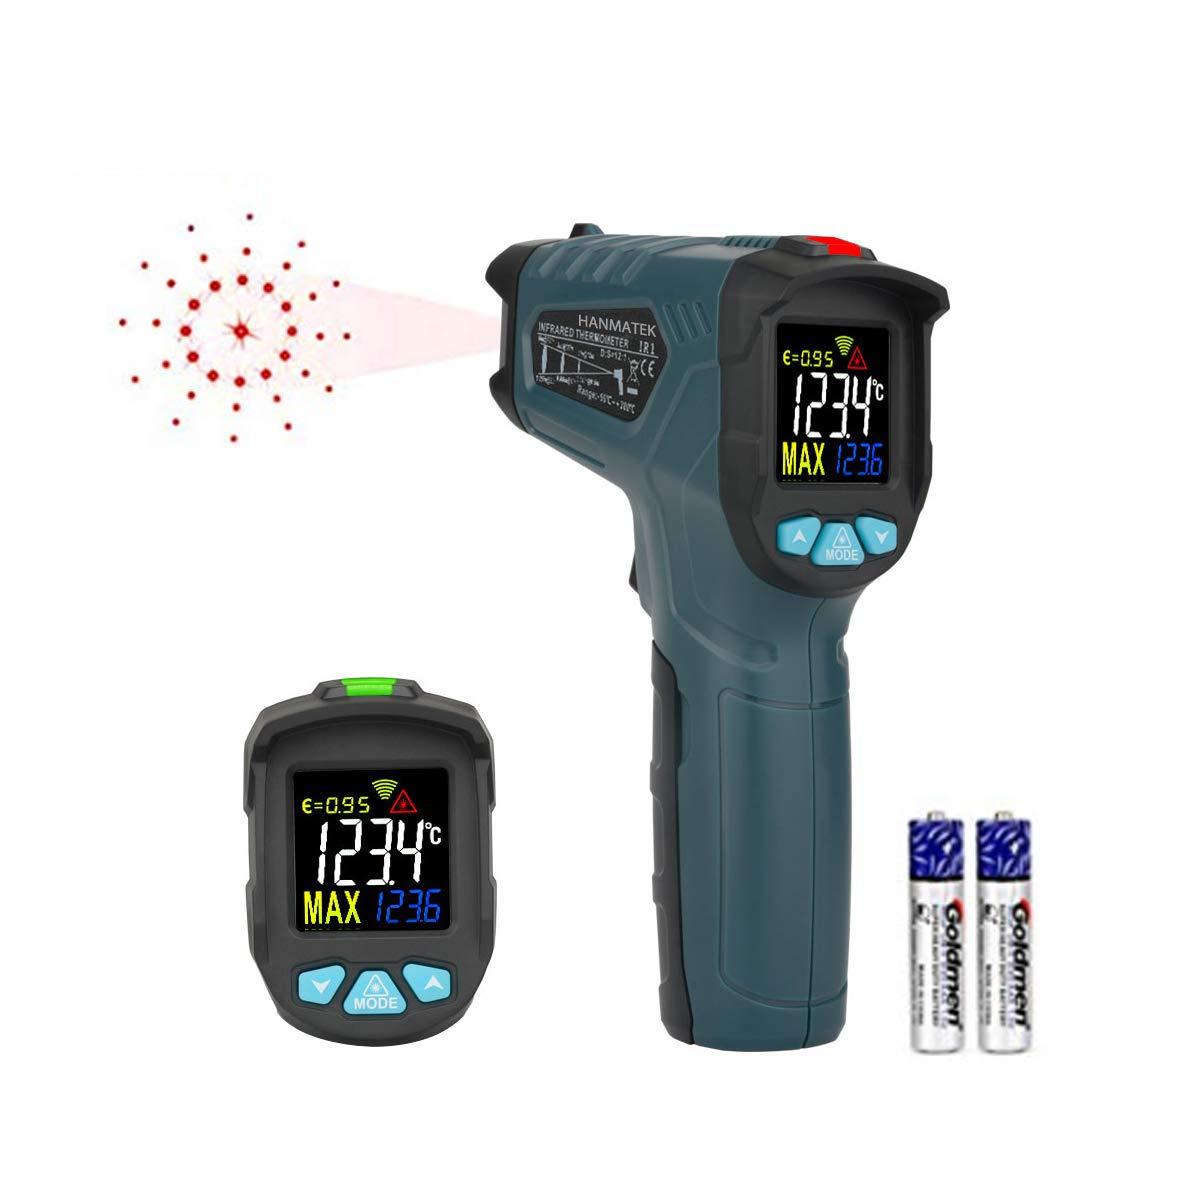 Termómetro Infrarrojo,HANMATEK Termómetro Láser Pistola de Temperatura de Lectura Instantánea Digital sin Contacto para Termostato Industrial con Retroiluminación de LCD